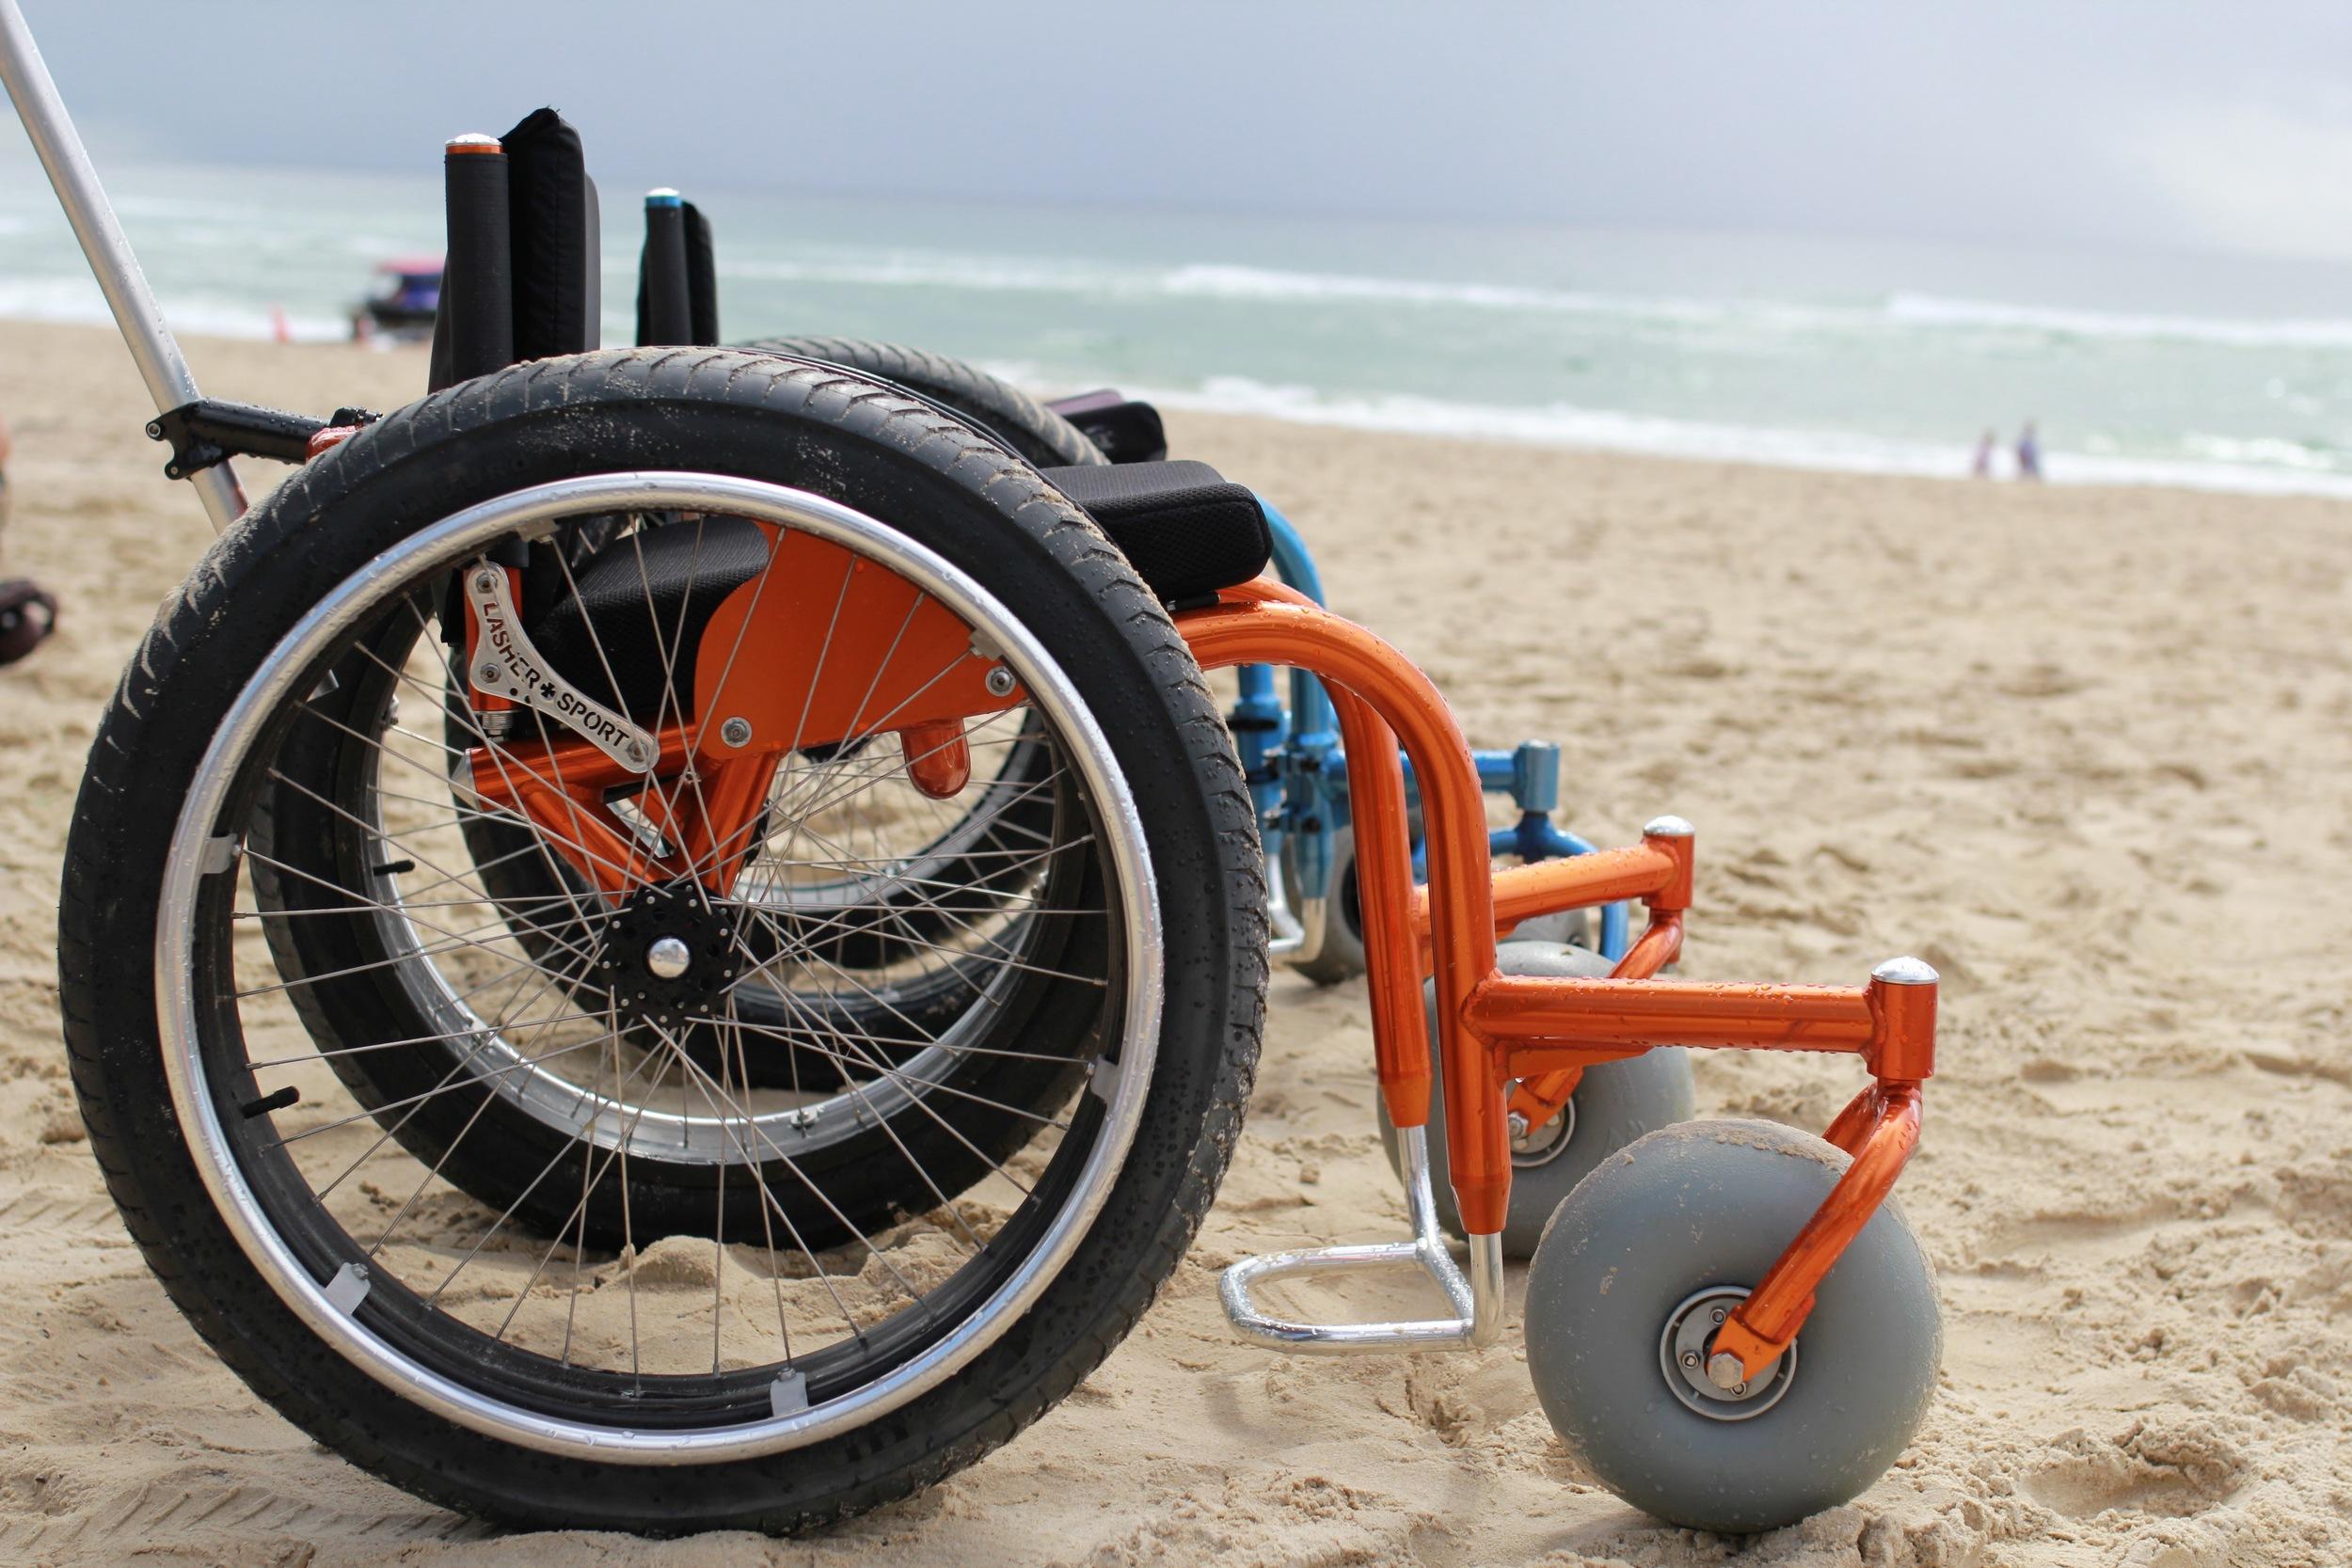 The Lasher Sport BT Beach Wheelchair